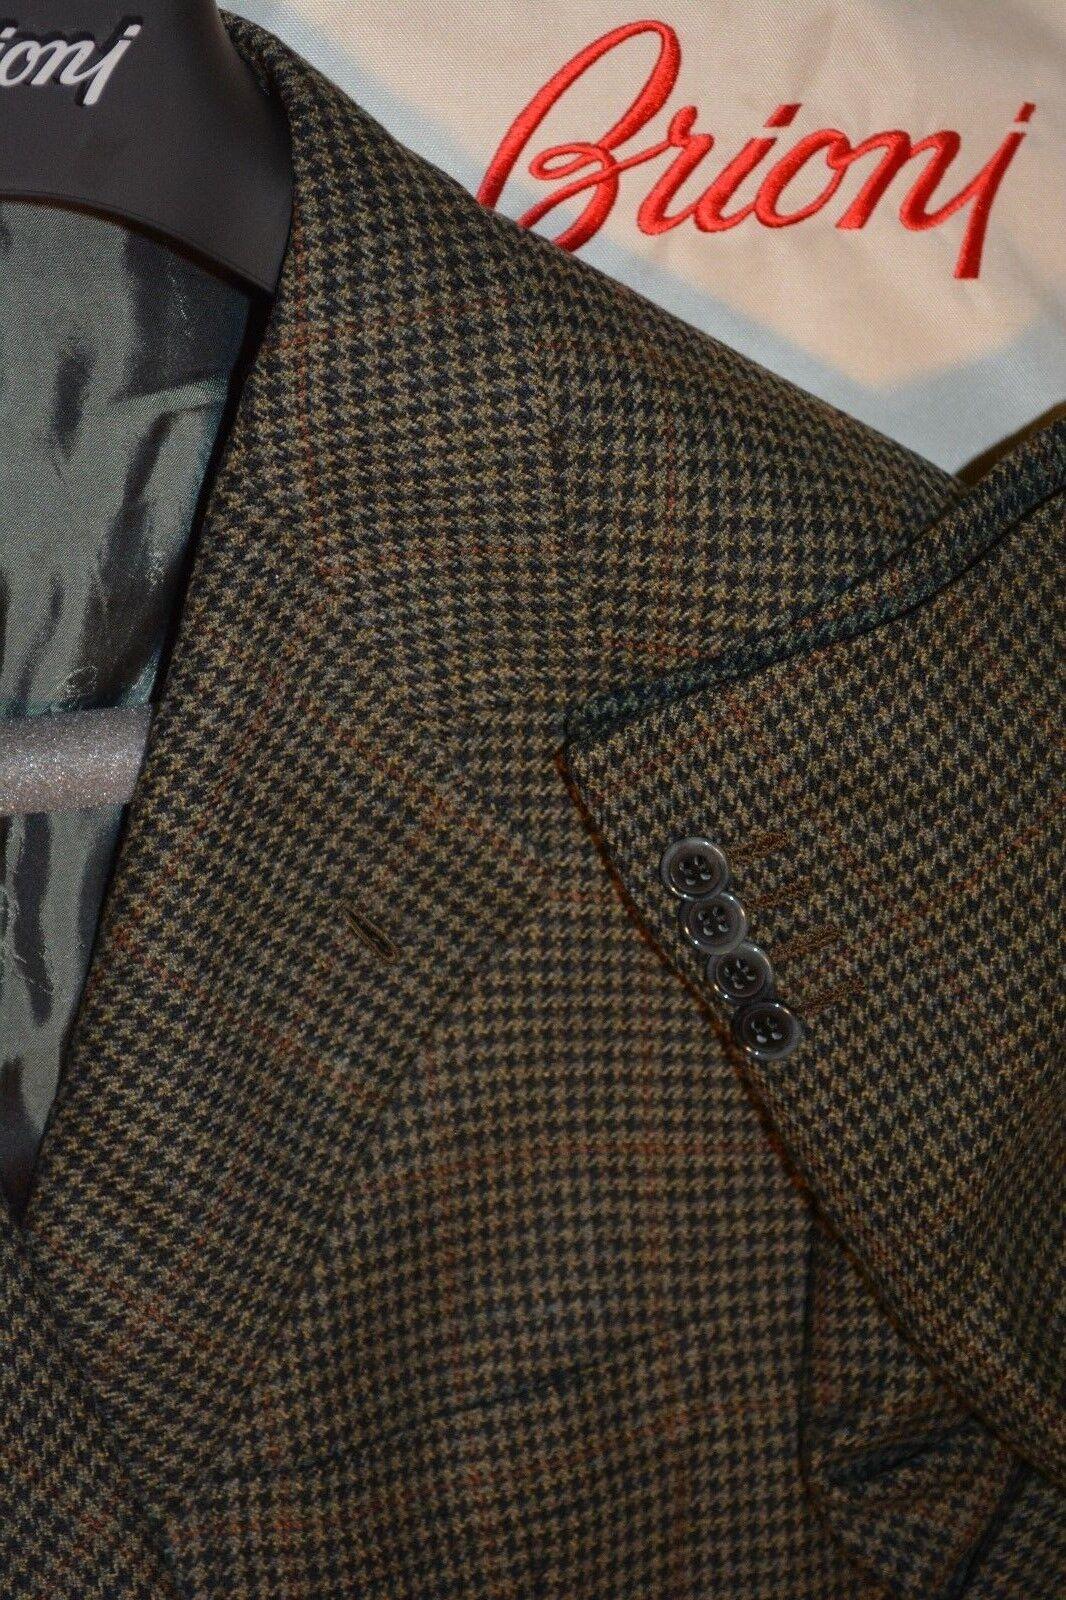 4295 Brioni Wool Cashmere Piuma Houndstooth Sportcoat / Blazer 40R 40 R